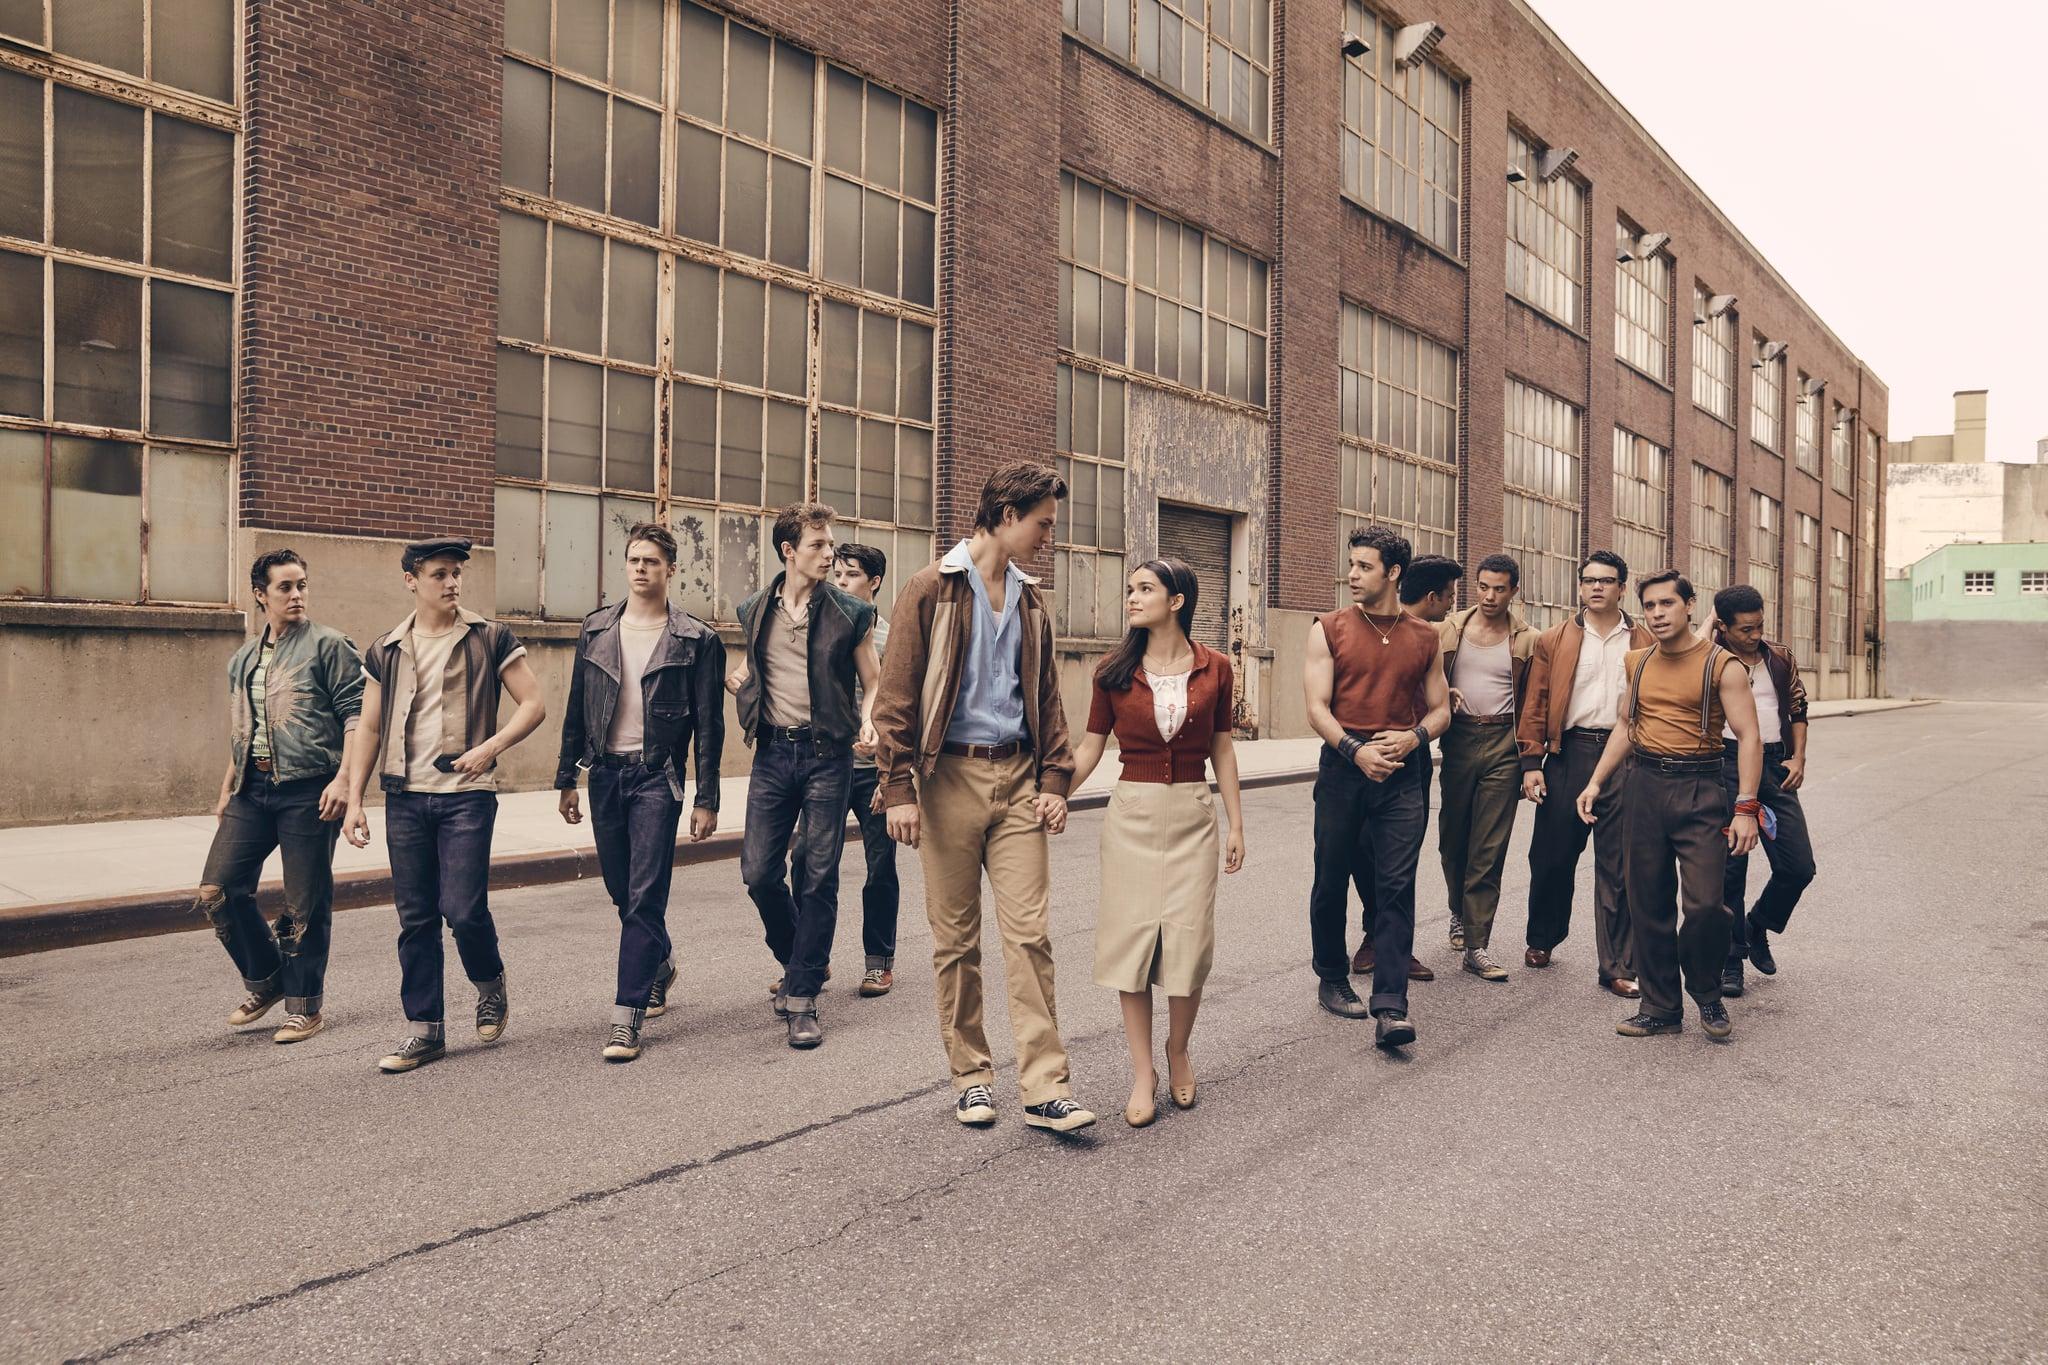 Steven Spielberg's West Side Story Remake Cast Photo | POPSUGAR Entertainment UK